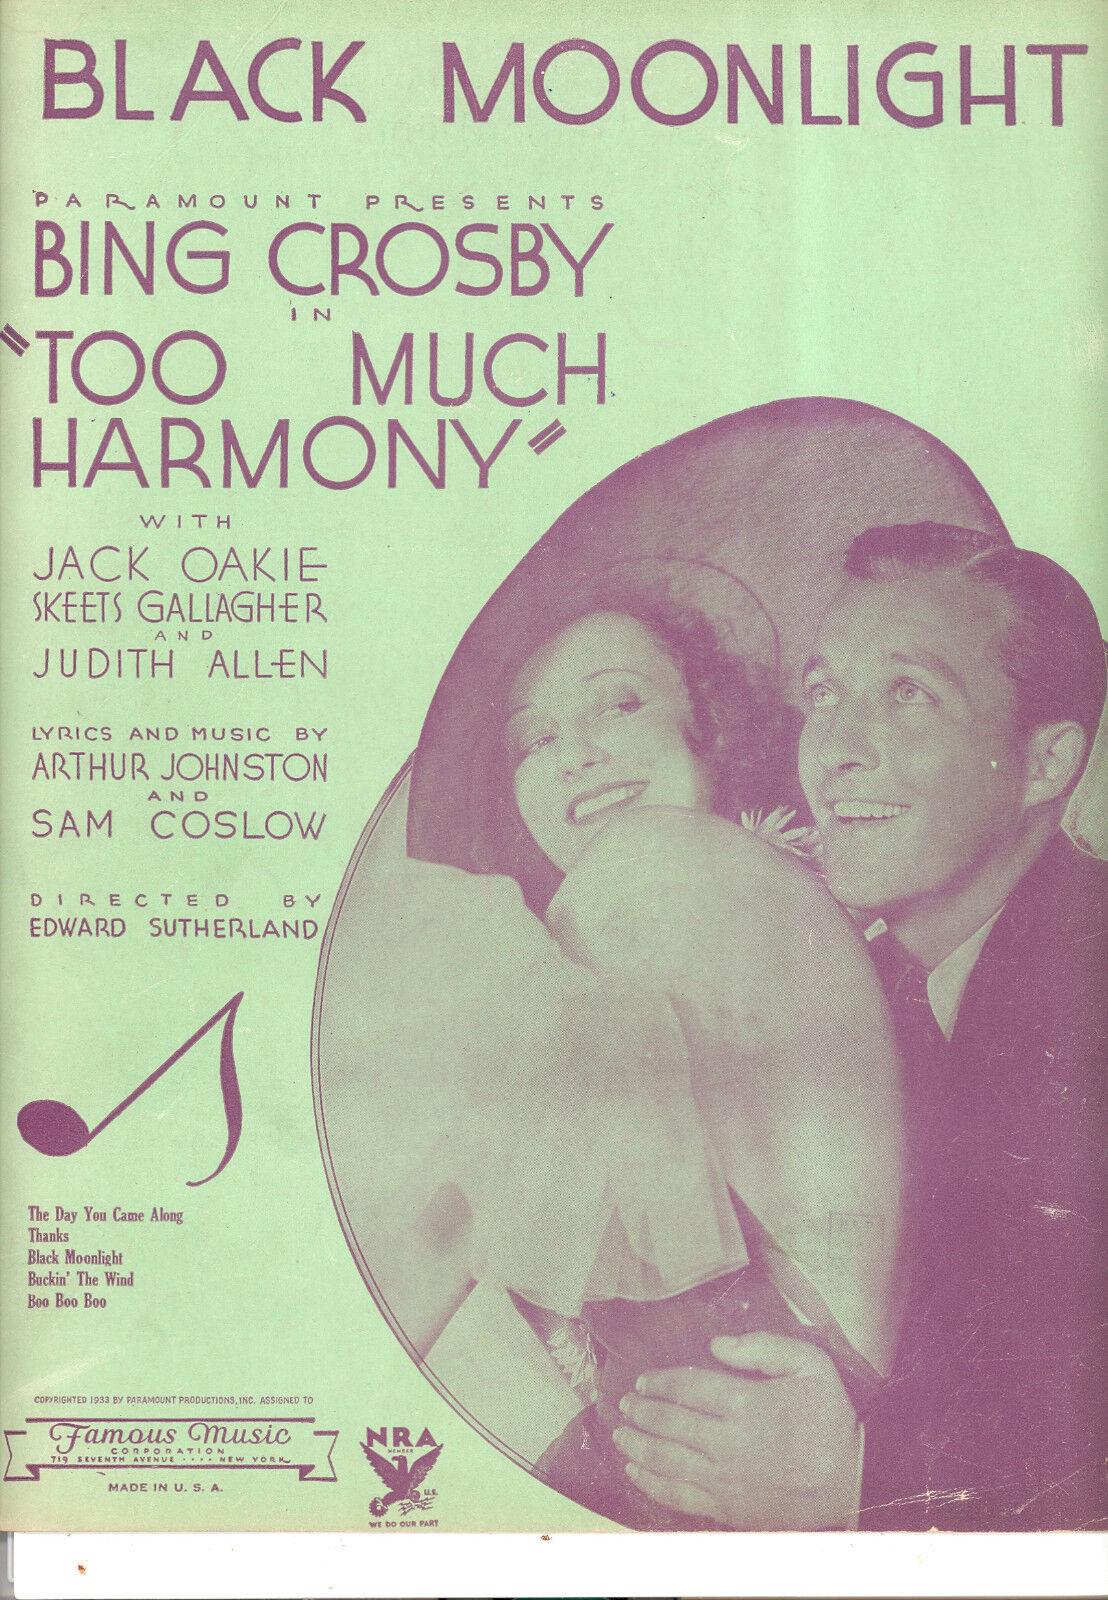 Too Much Harmonie Notenblatt   Schwarz Moonlight   Bing Crosby Judith Allen